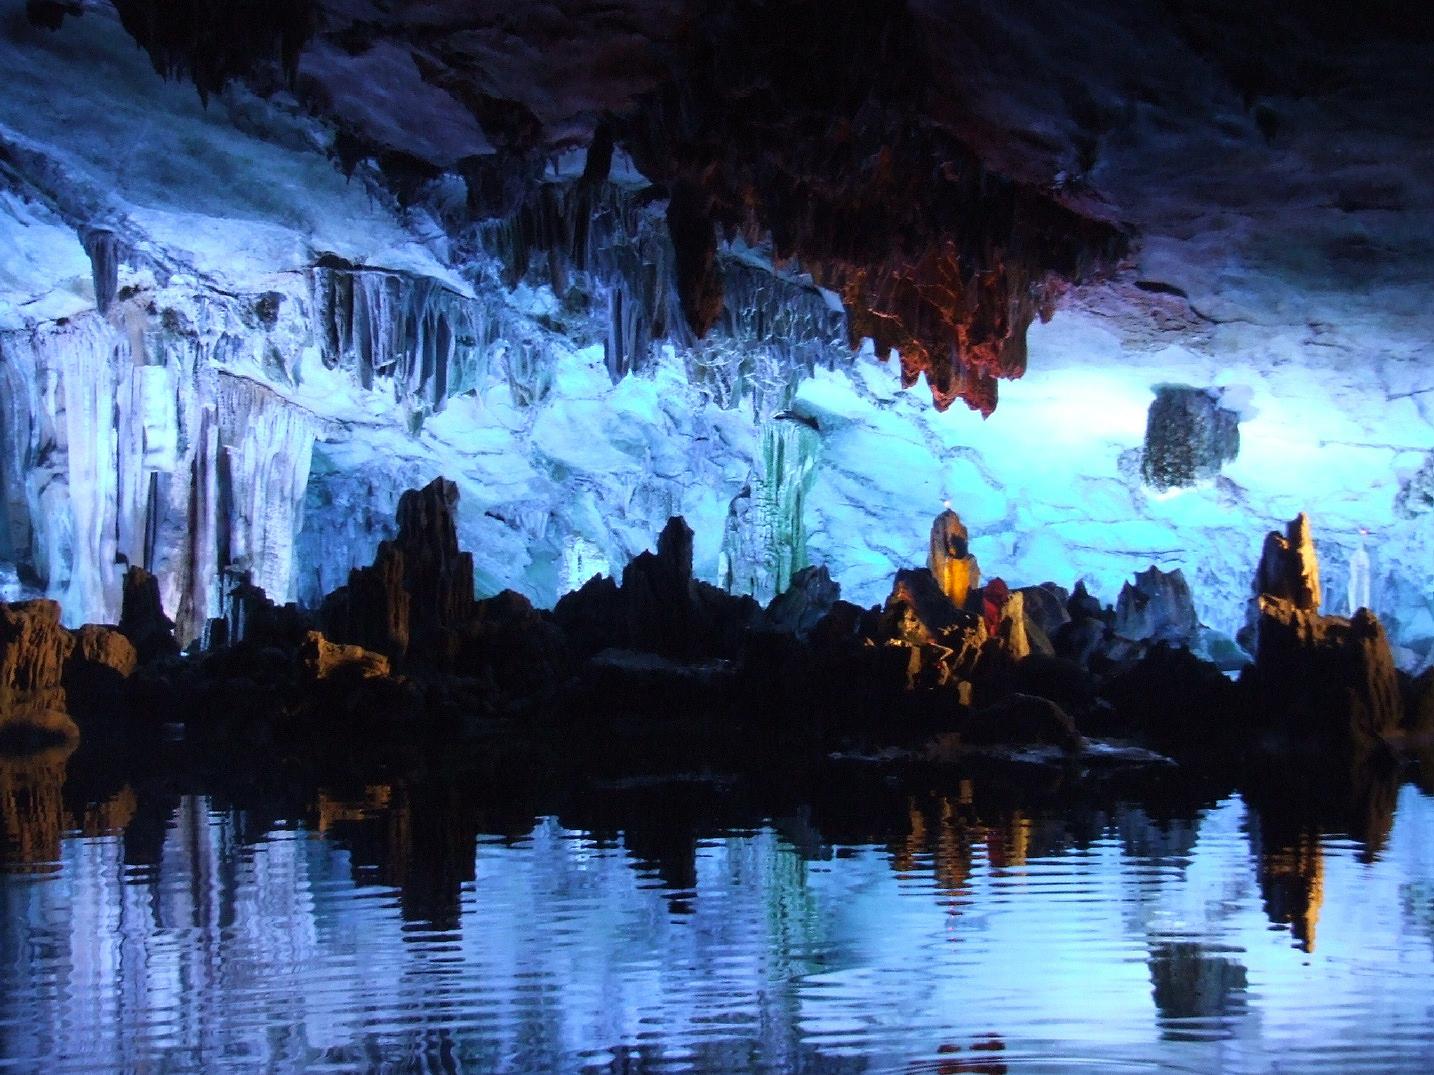 Caverna Reed Flute, na China, com lago refletindo as estalagmites